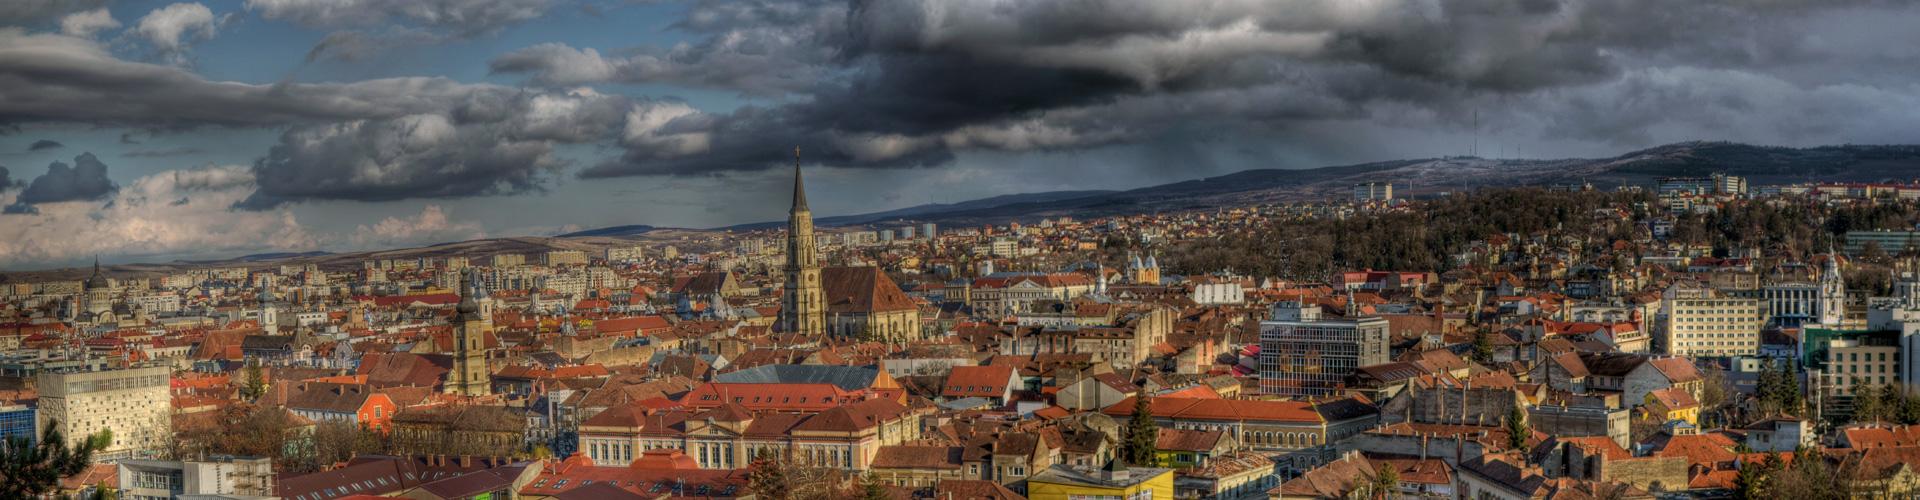 TransferTaxi-EUROPE | Cluj-Napoca - TransferTaxi-EUROPE